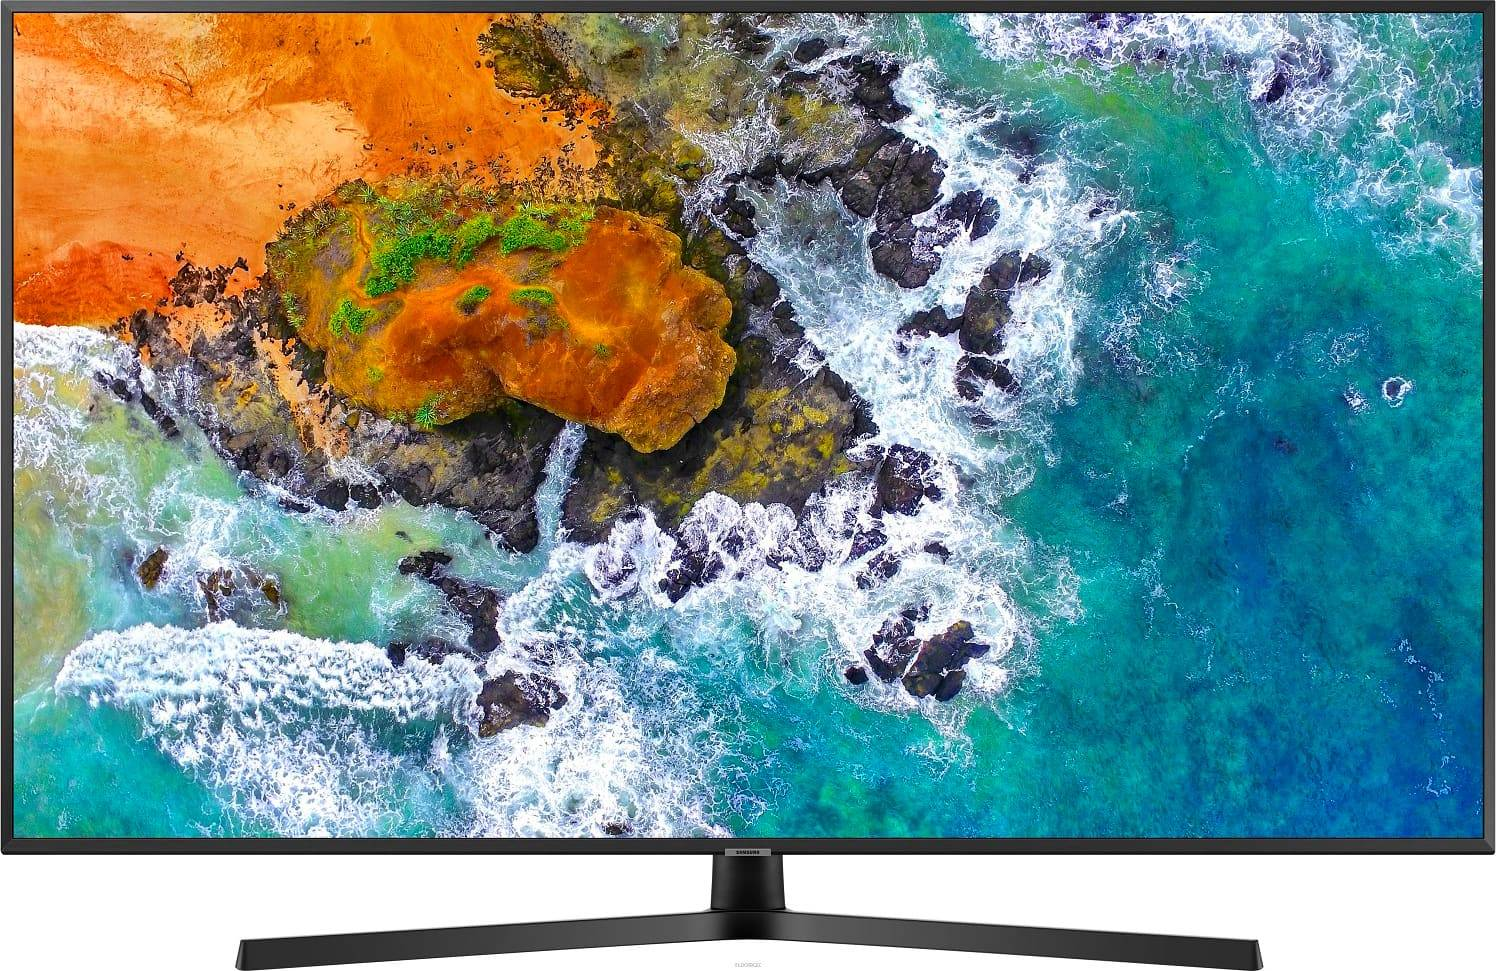 Samsung Ue50nu7400uxzt Tv Led 50 Pollici 4k Ultra Hd Smart Tv Internet Tv Lan Wifi Dlna Hdmi - Ue50nu7400uxzt Serie Nu7400 ( Garanzia Italia )